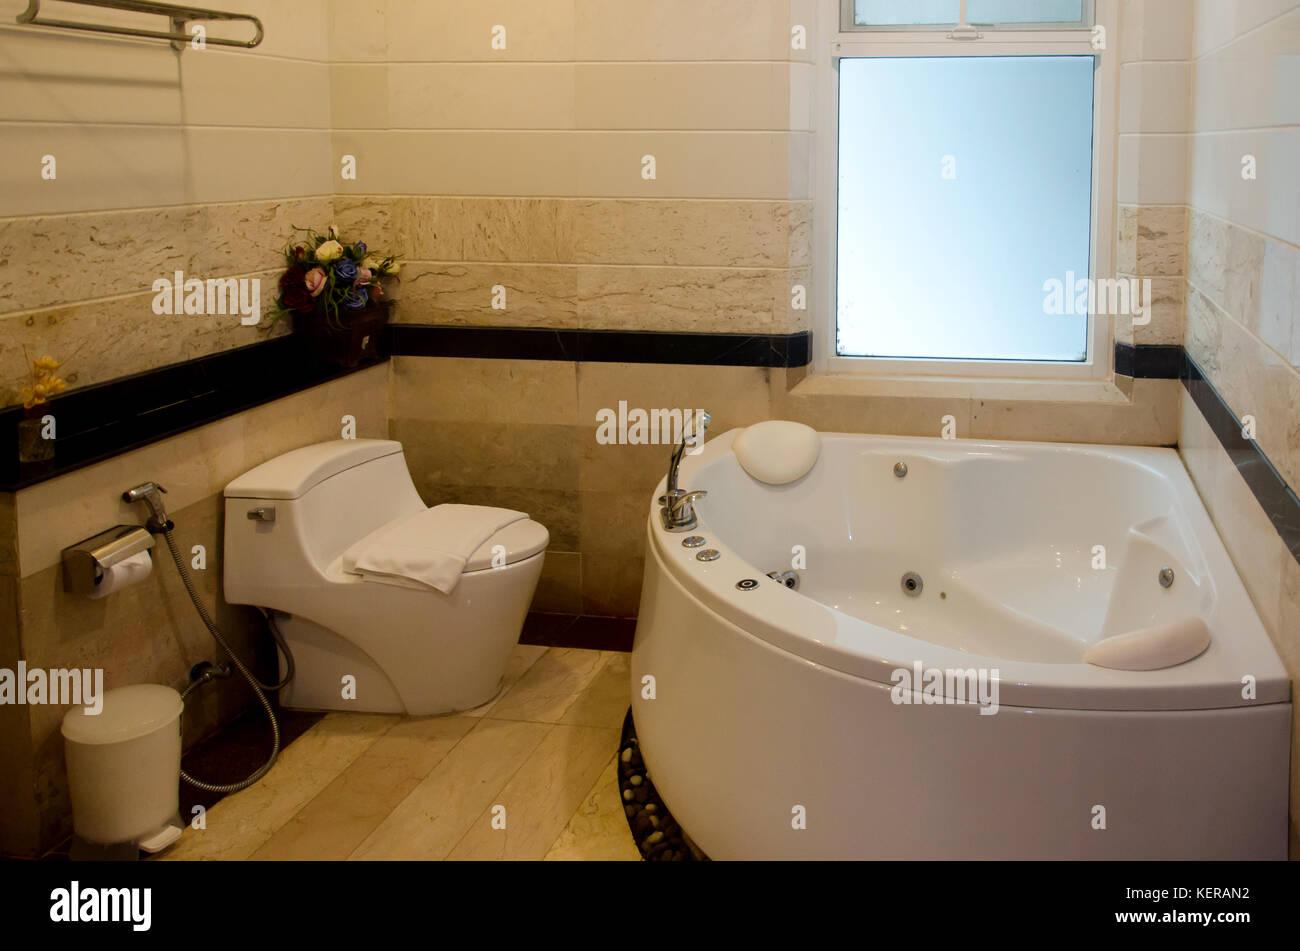 Modern Bathroom Interior With Bathtubs And Sinks Stock Photo Alamy